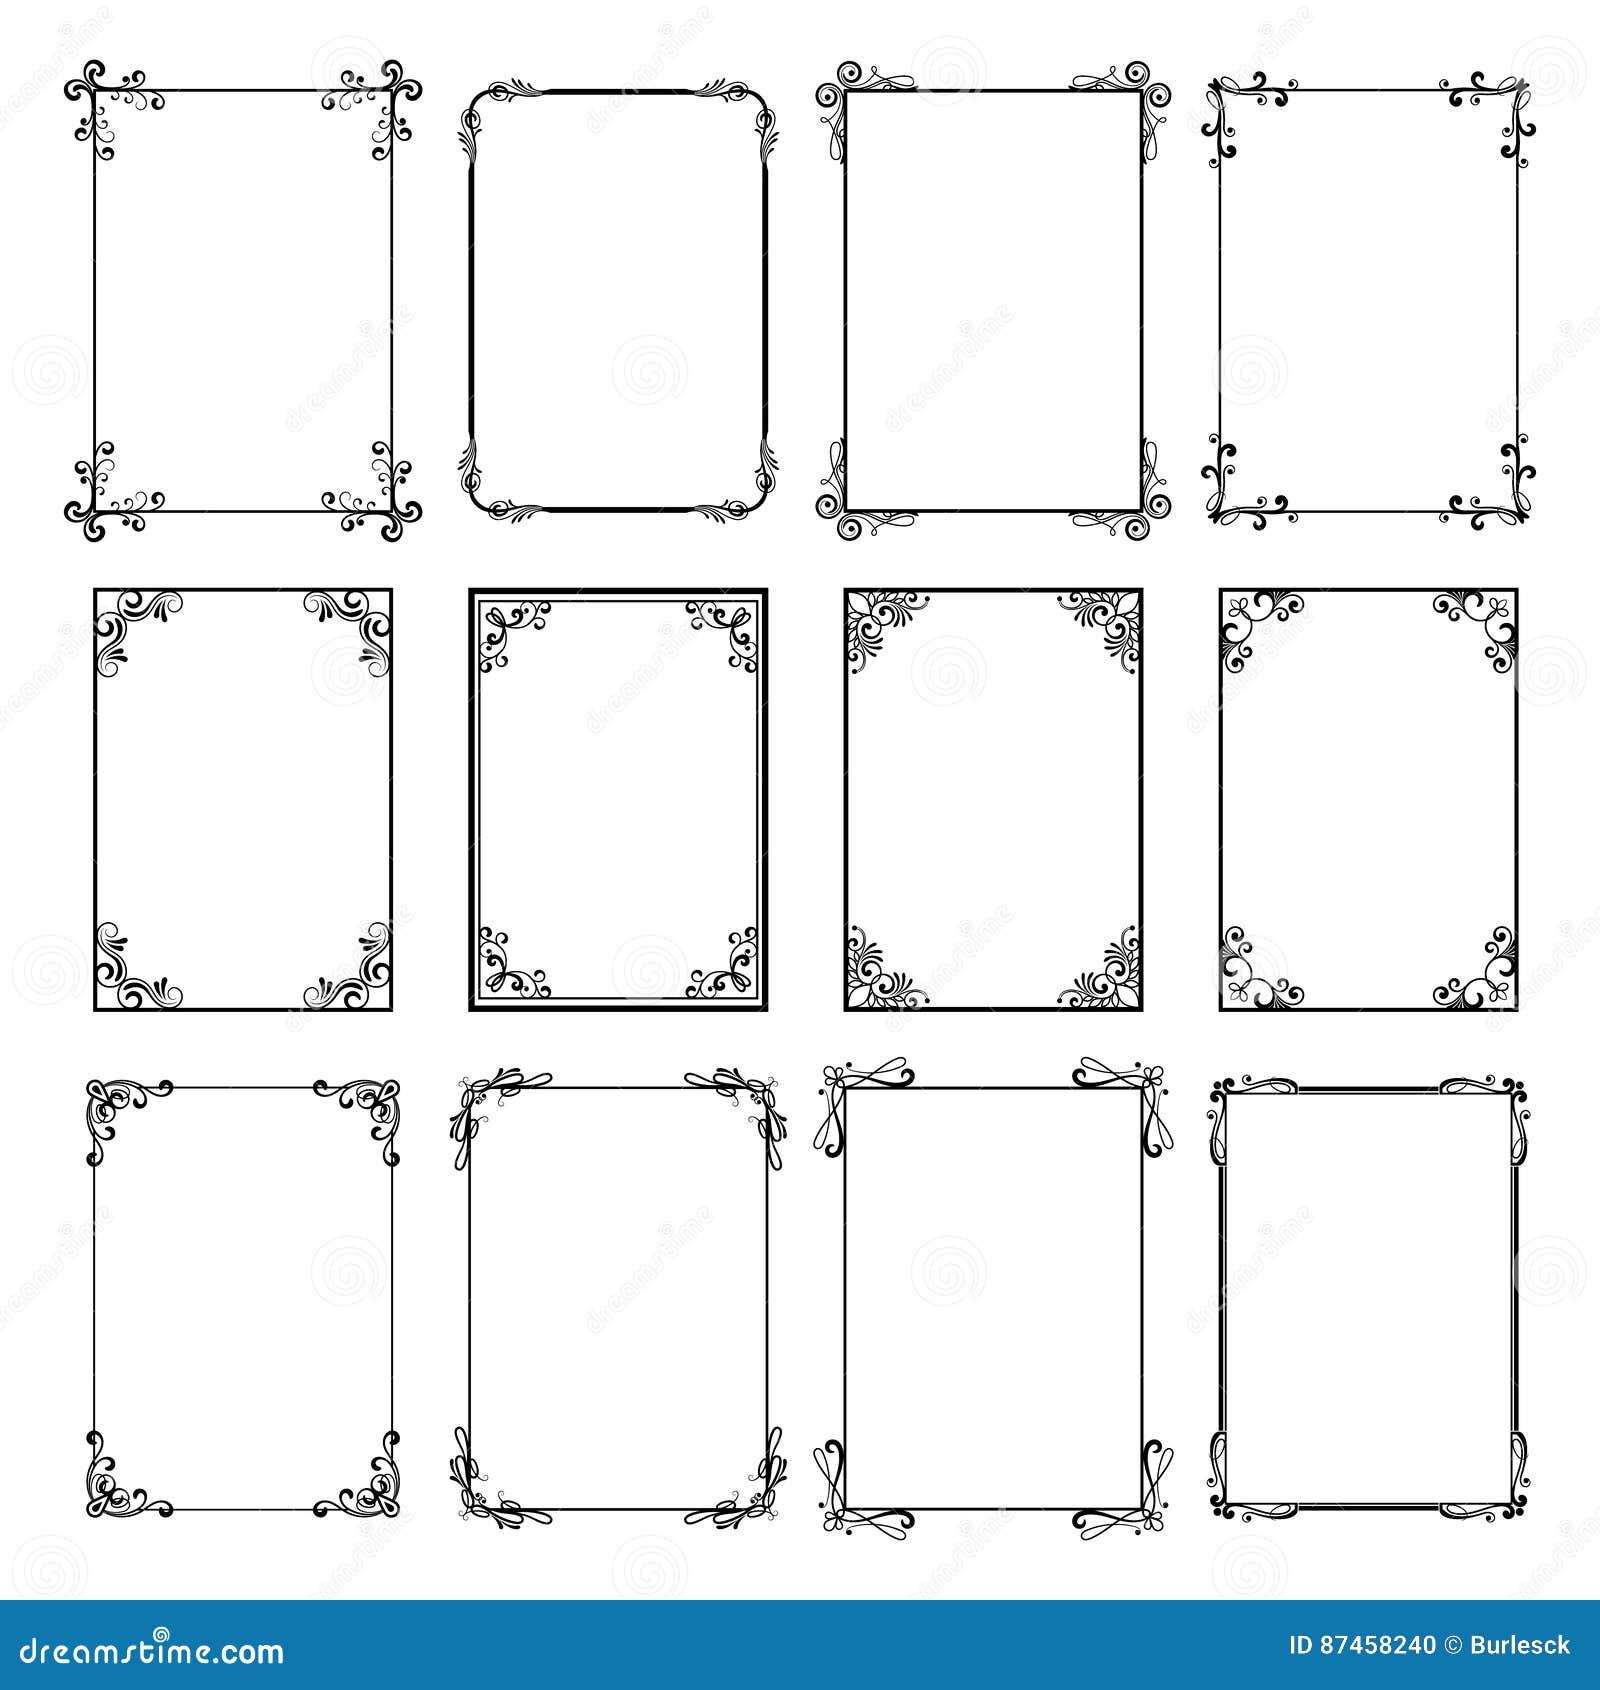 Decorative vintage frames vector black borders isolated on white decorative vintage frames vector black borders isolated on white background frame templates for cards design jeuxipadfo Choice Image